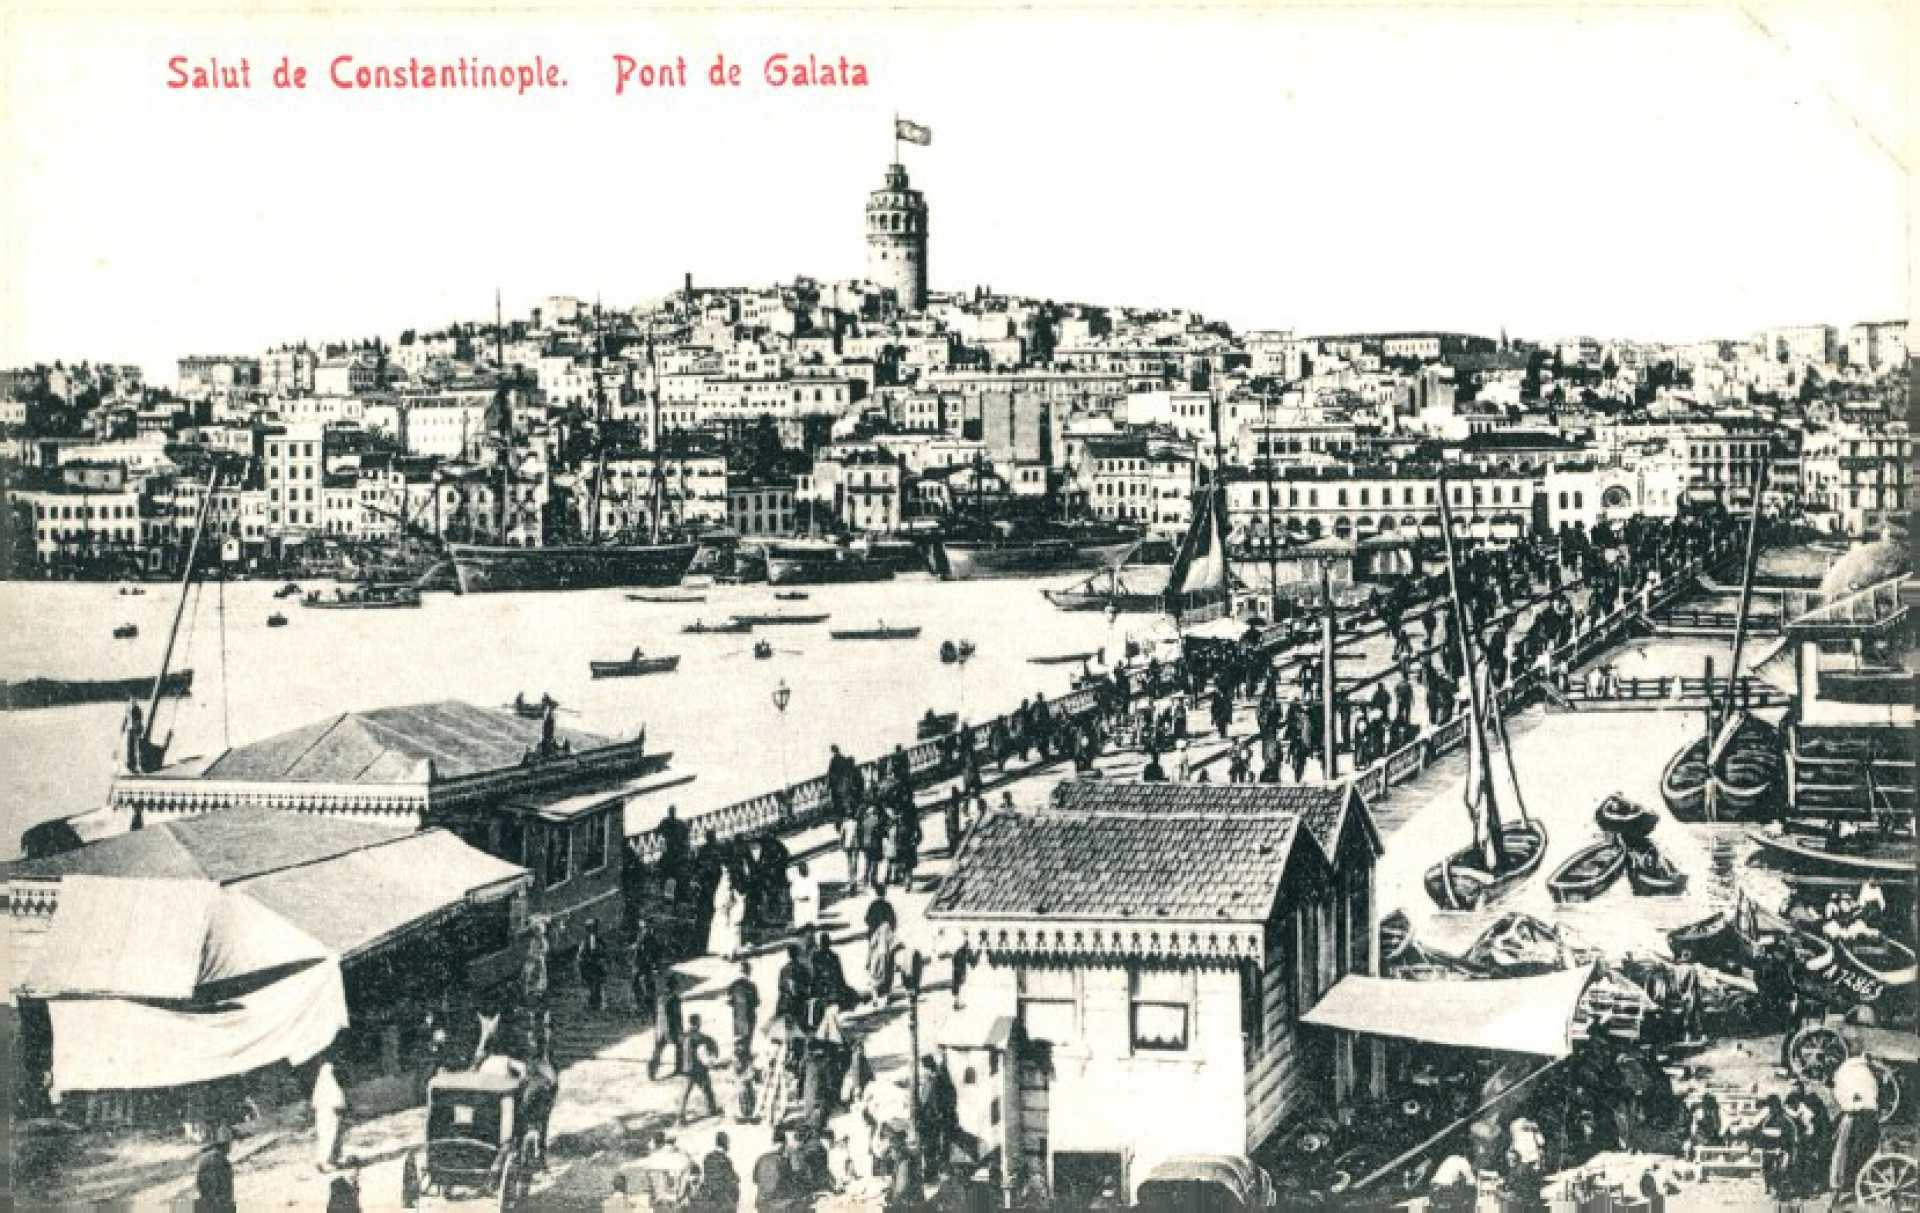 Salut de Constantinople. Pont de Galata